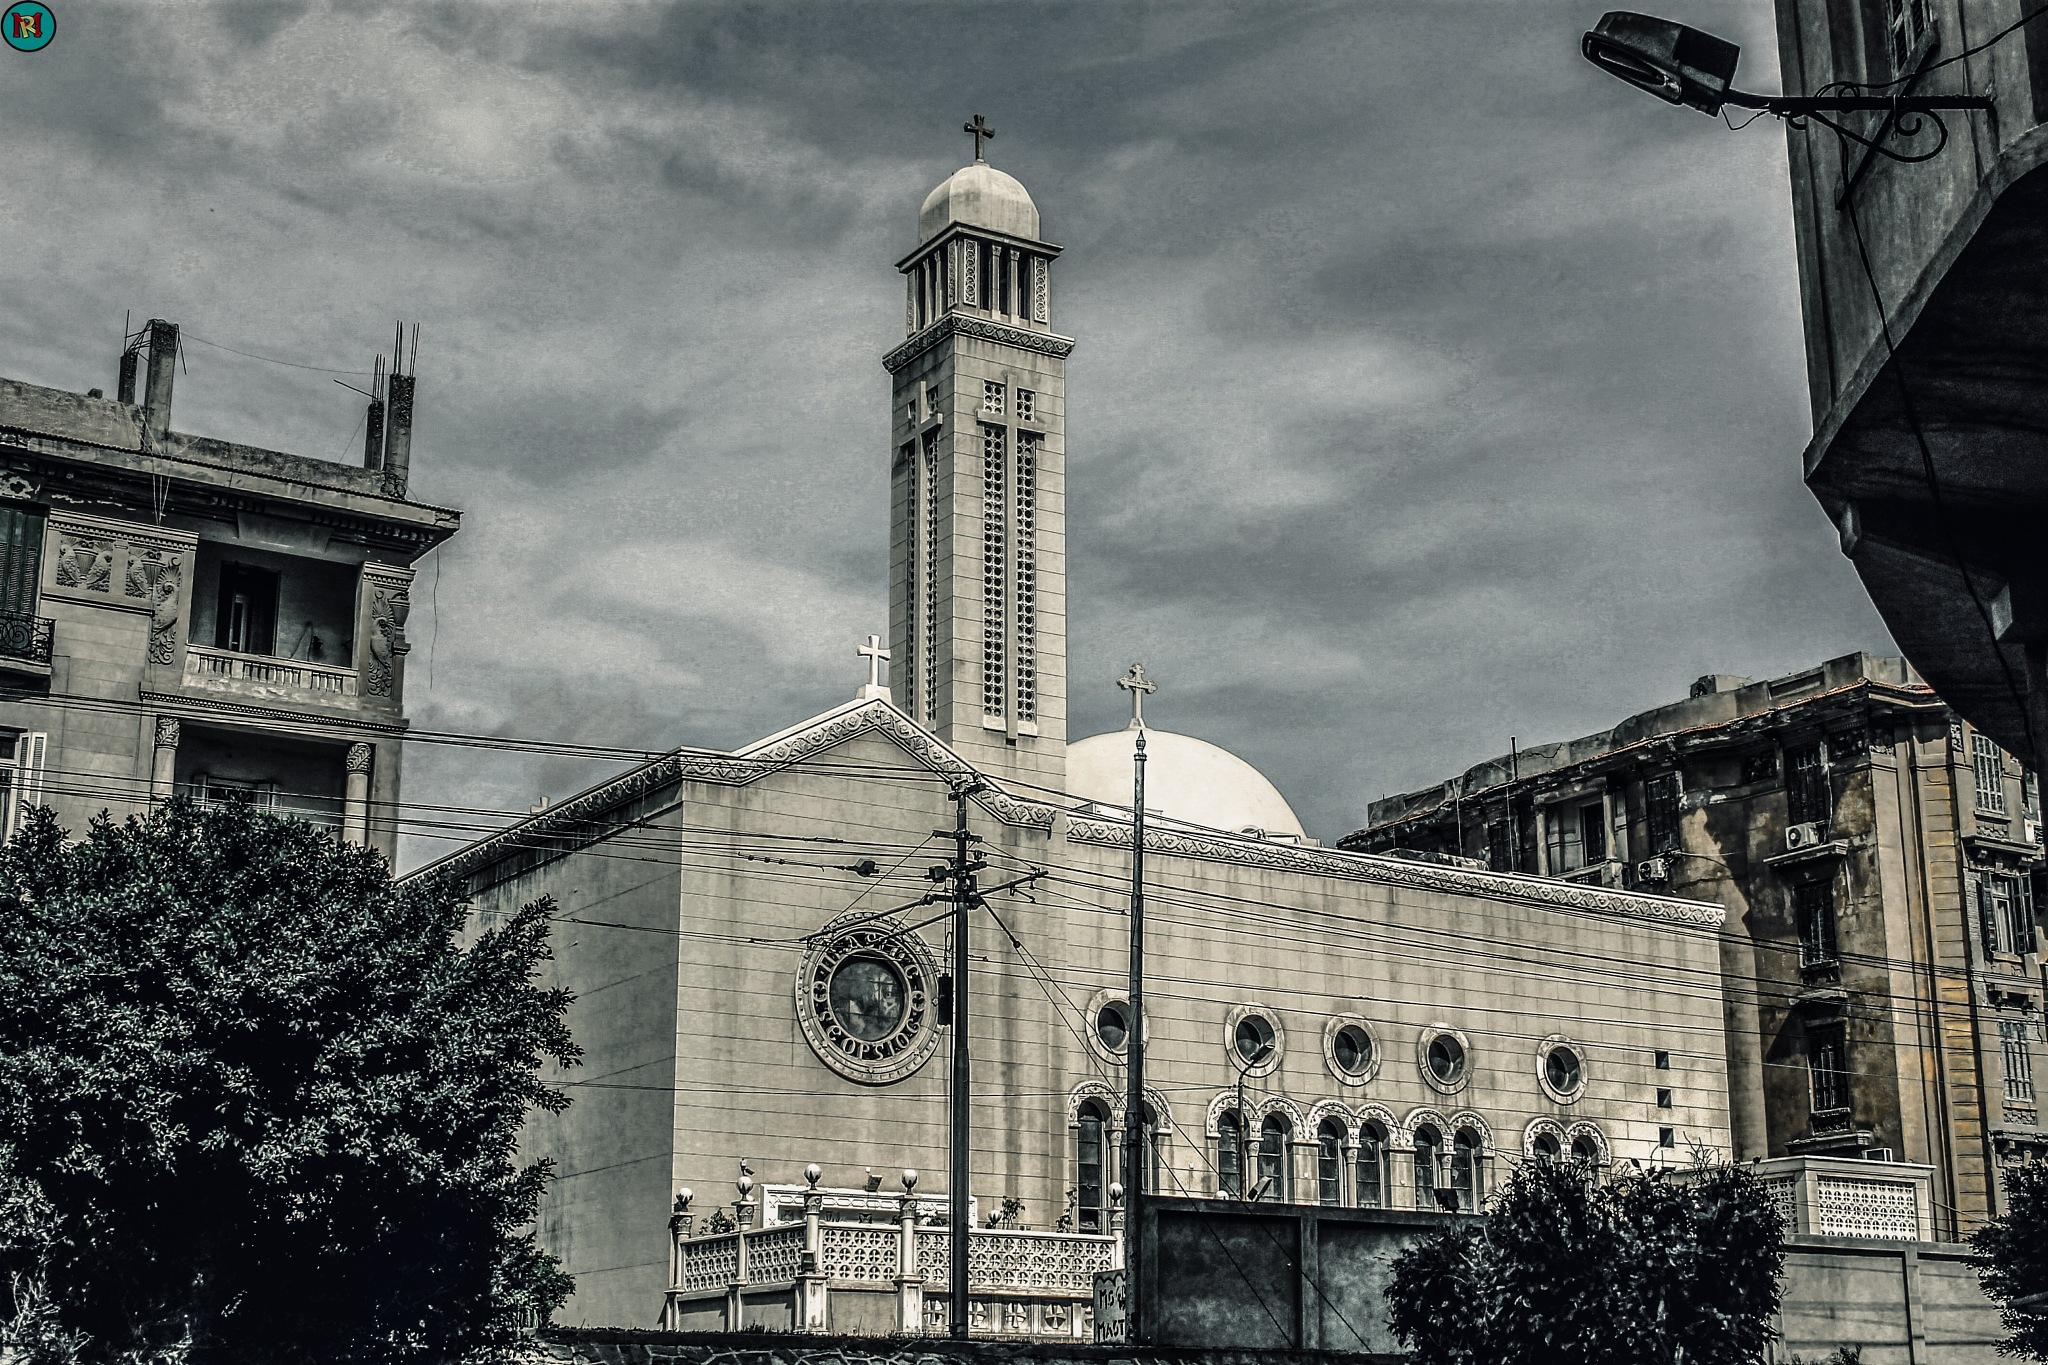 Margerges Church by Muhammad Radi